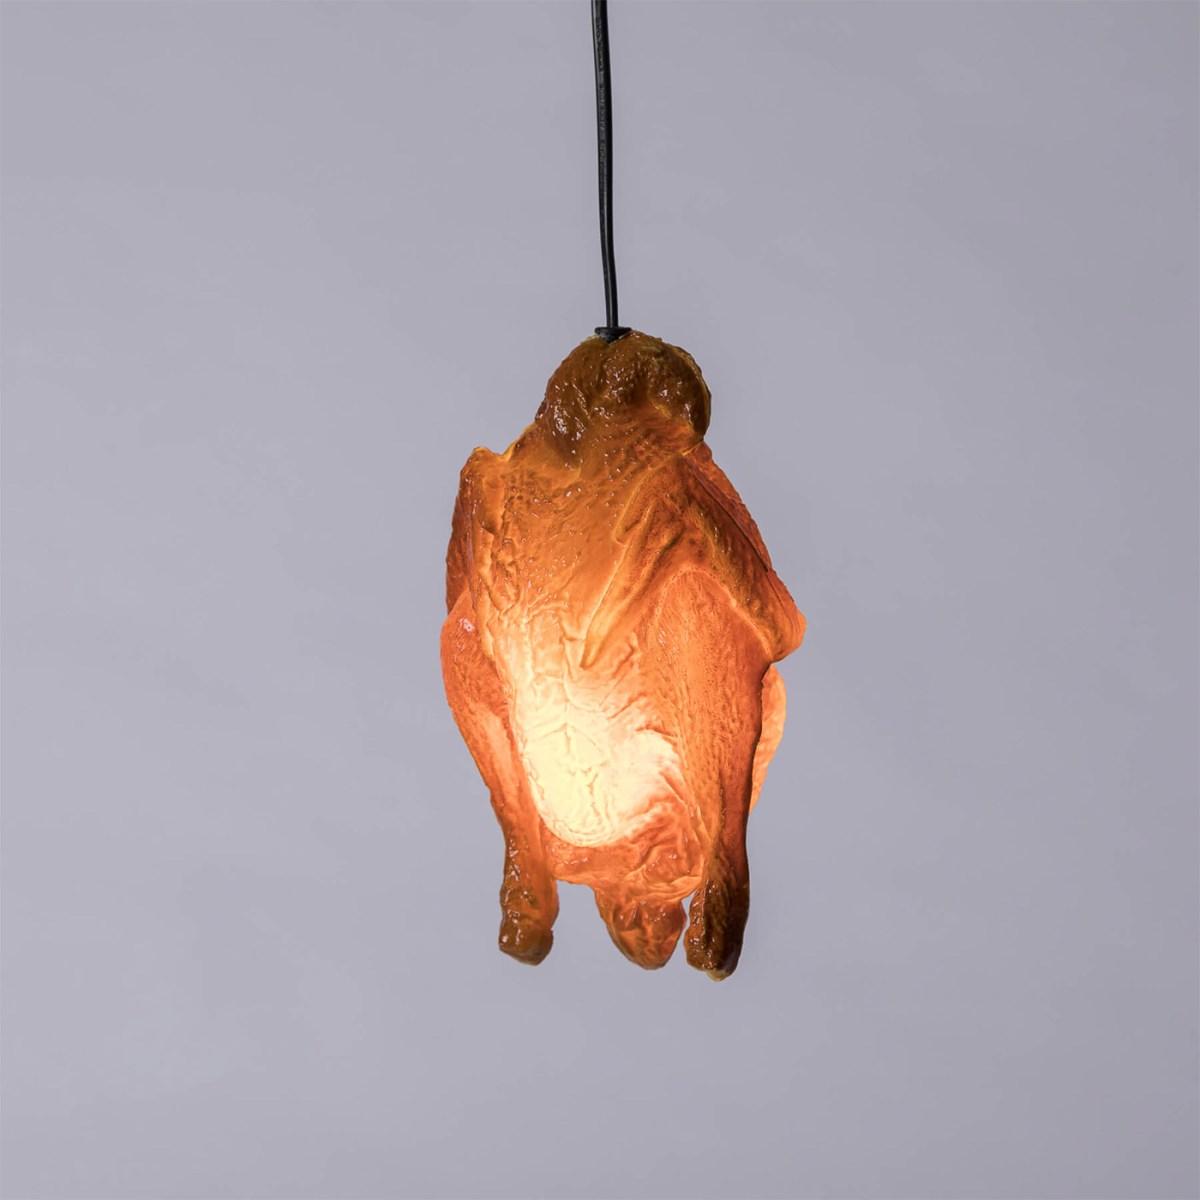 lighting-rrudi-10